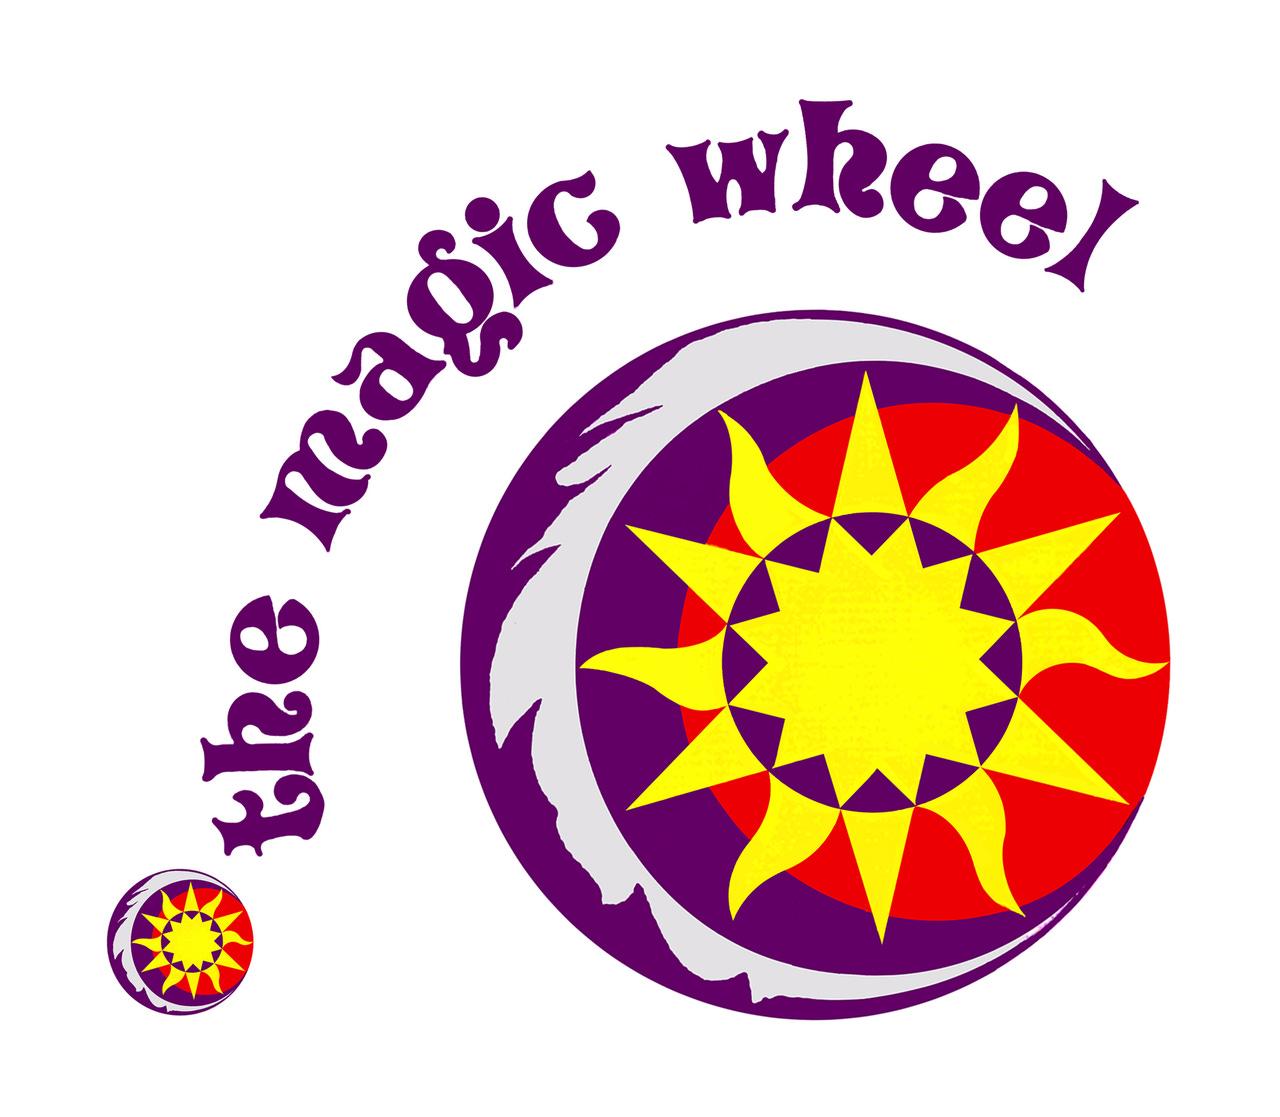 The Magic Wheel - Interpretation in our Time